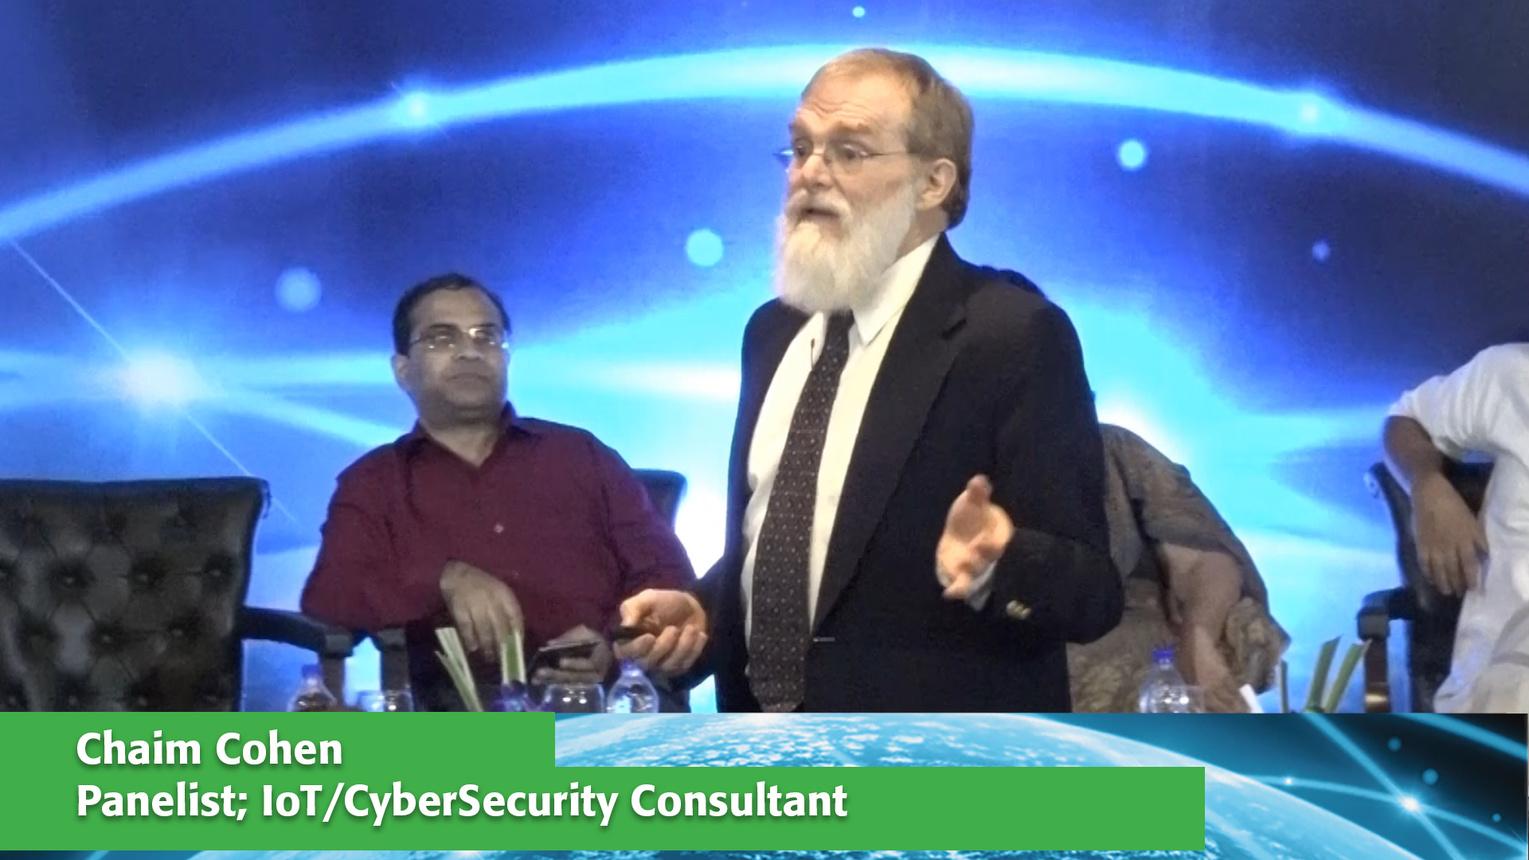 Panelist: Chaim Cohen - ETAP Delhi 2016